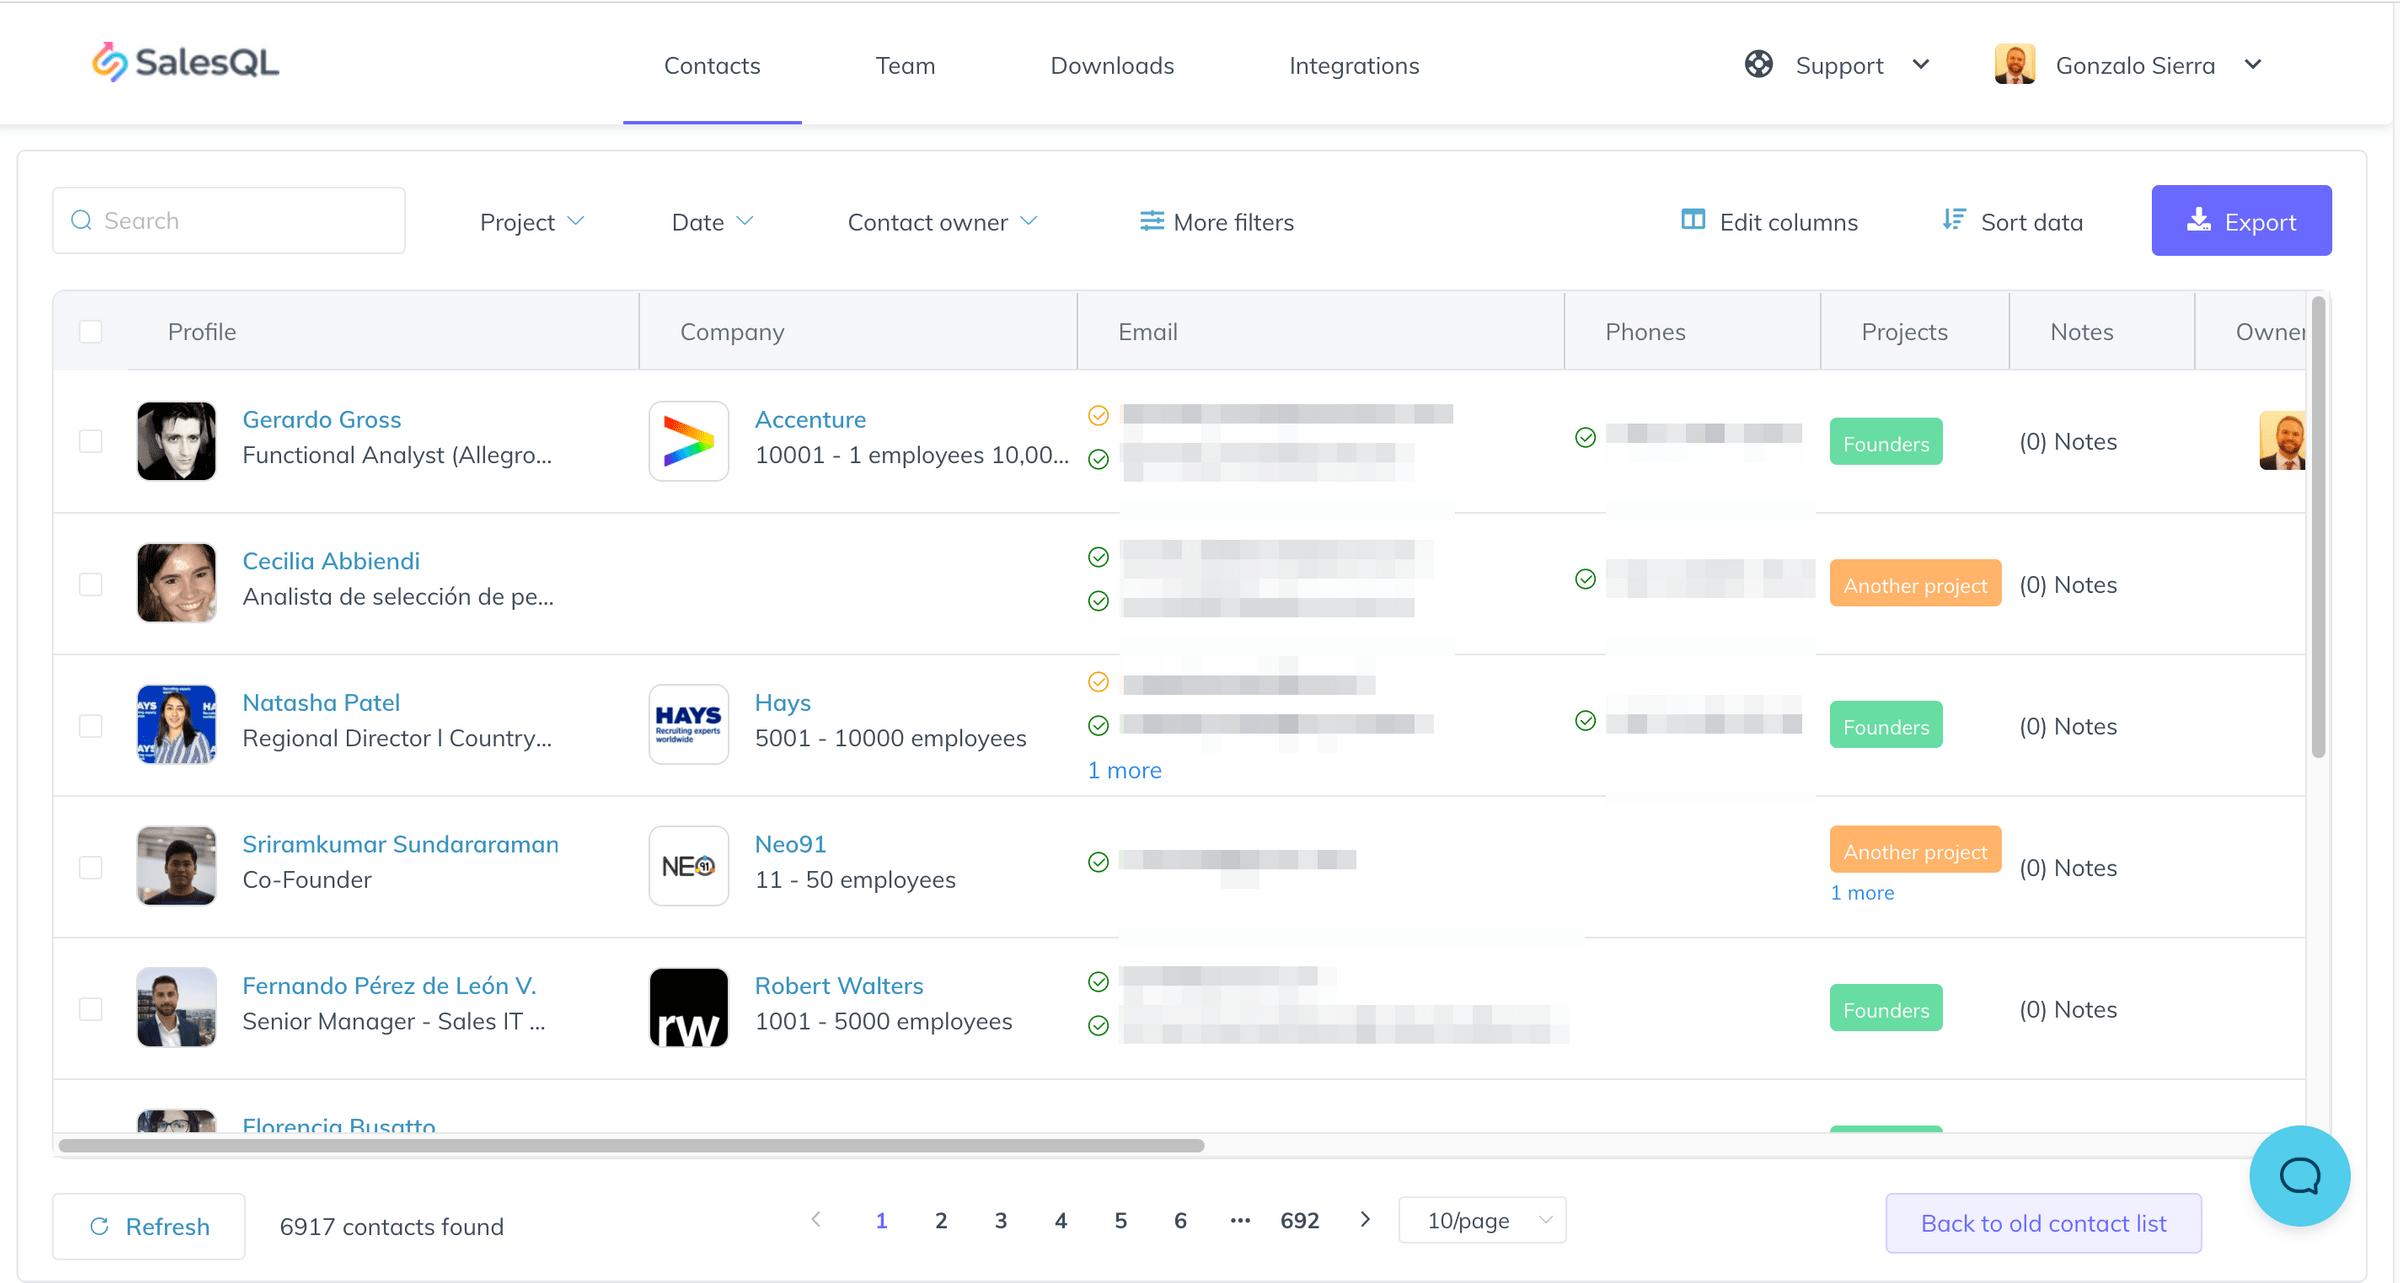 salesql dashboard 2020 1